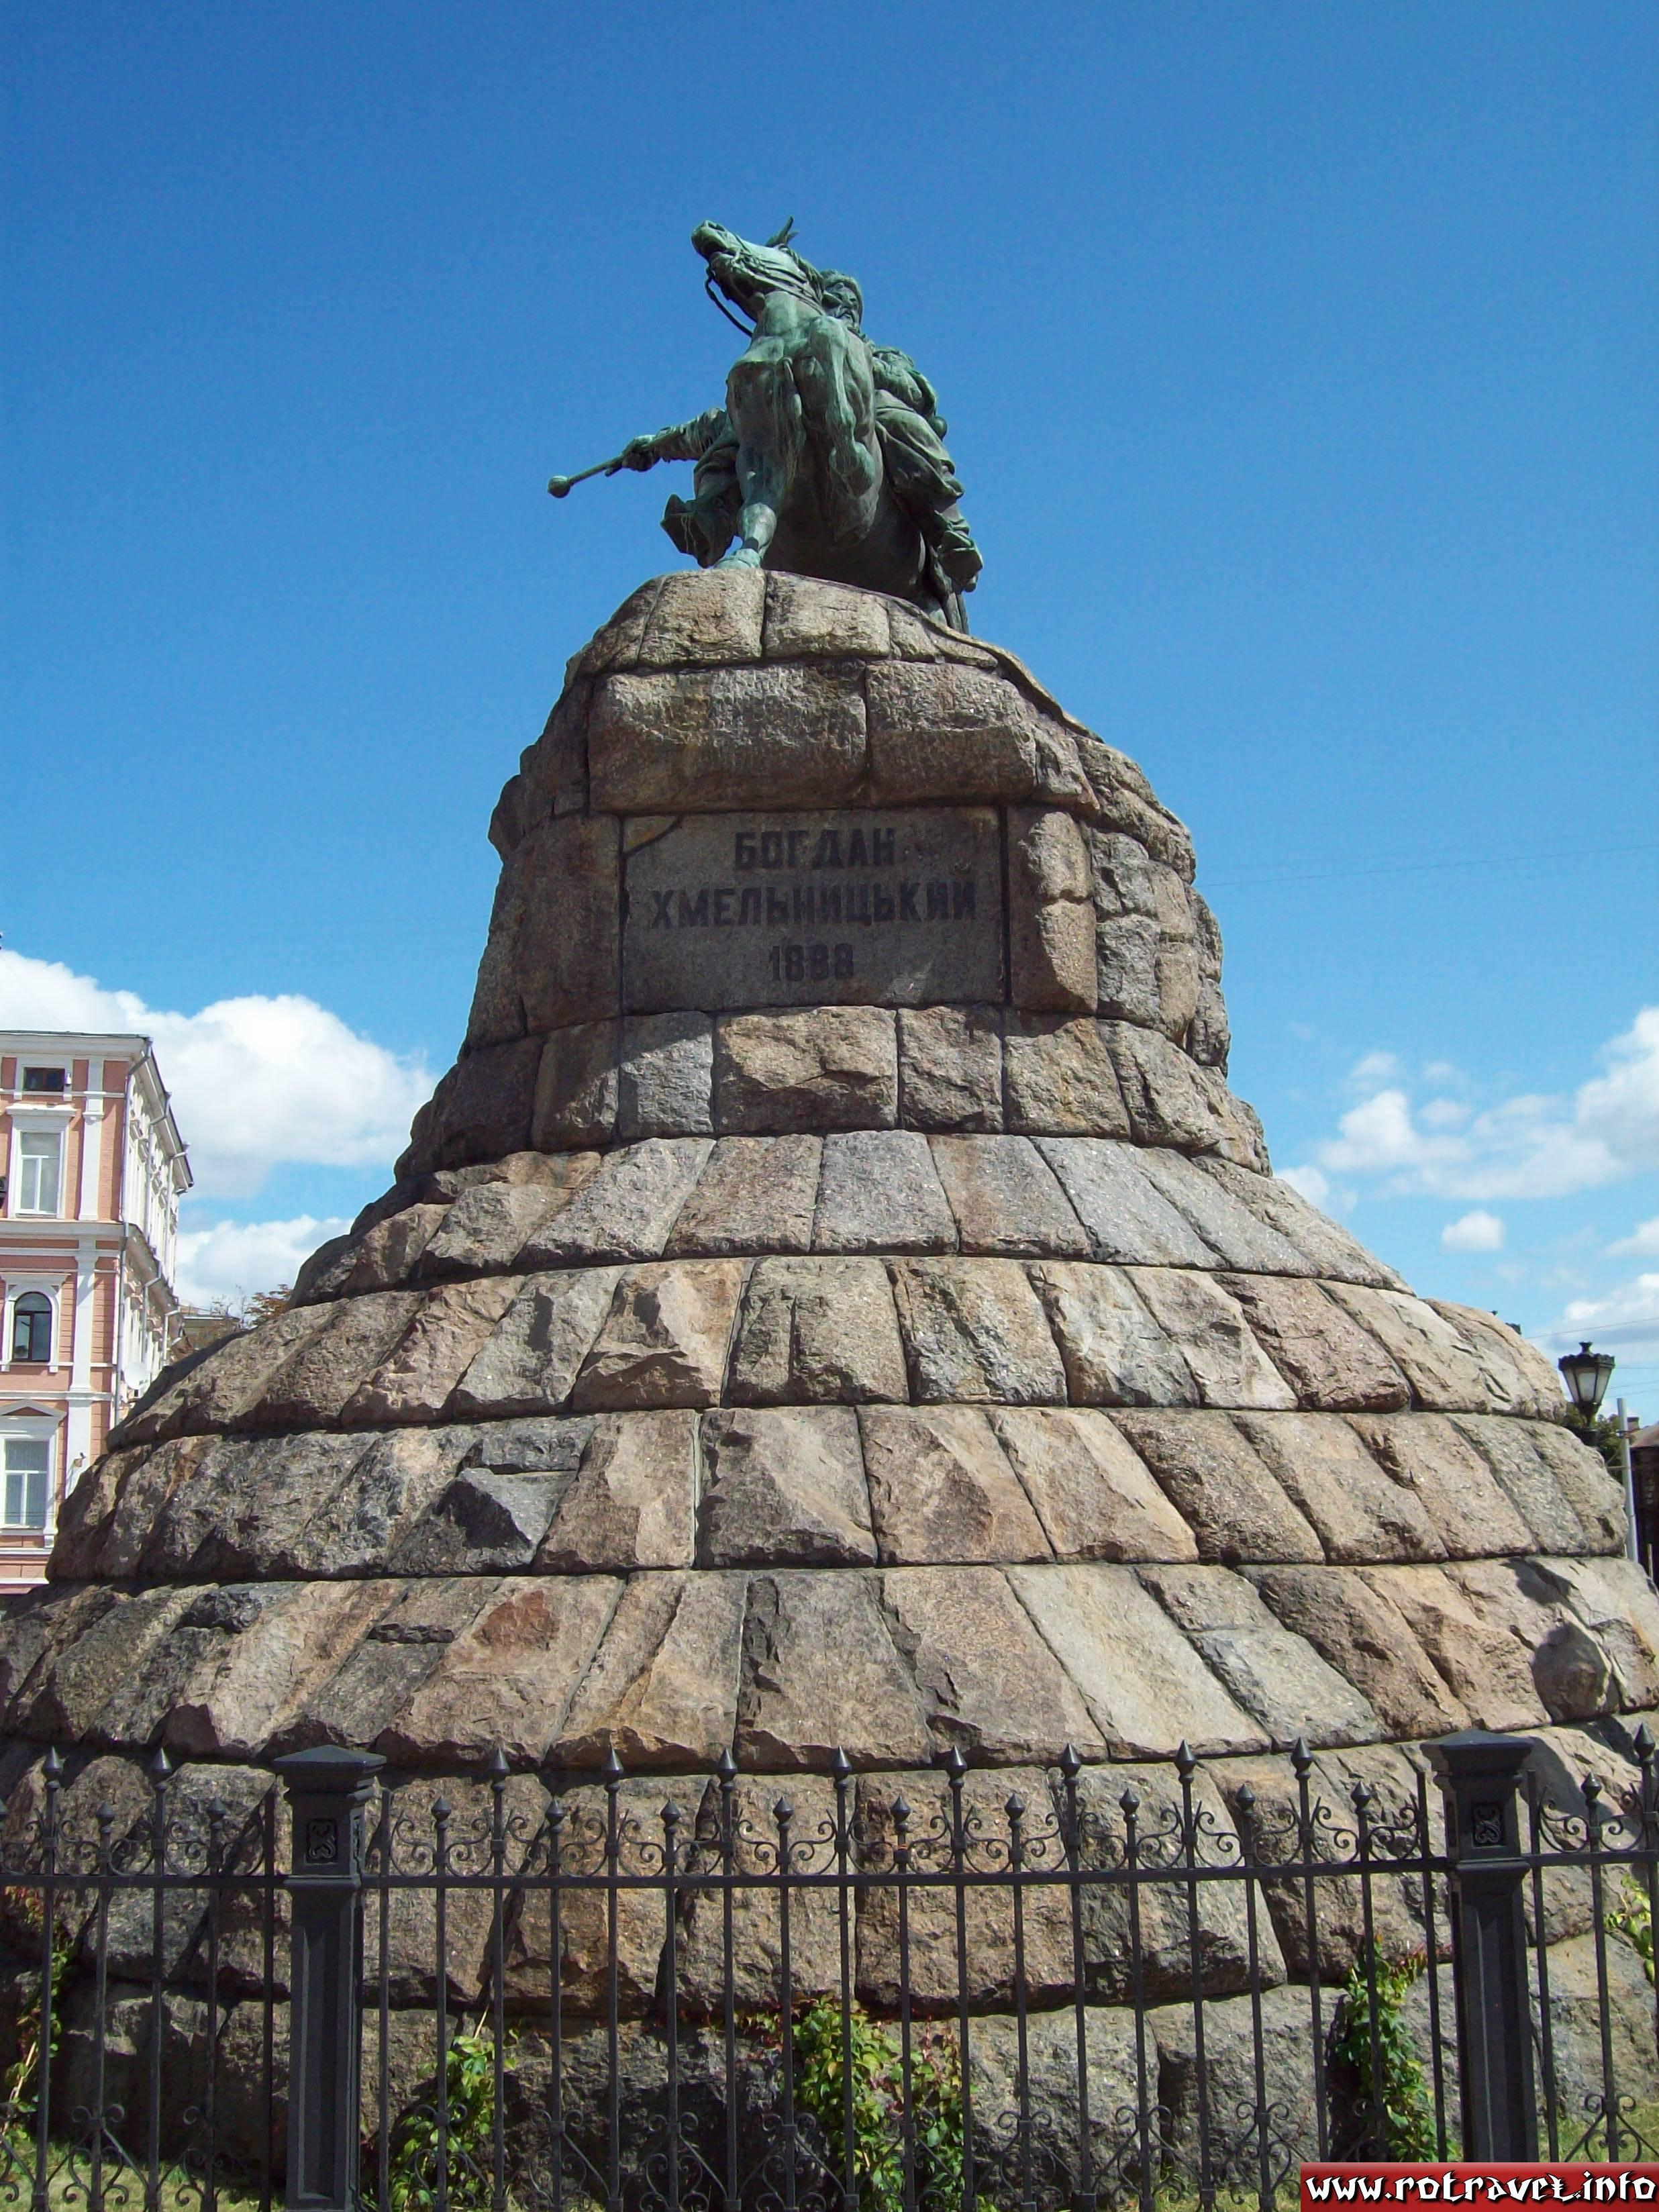 The statue of Bohdan Khmelnytsky in front of the Saint Sophia Cathedral in Kiev, Ukraine.